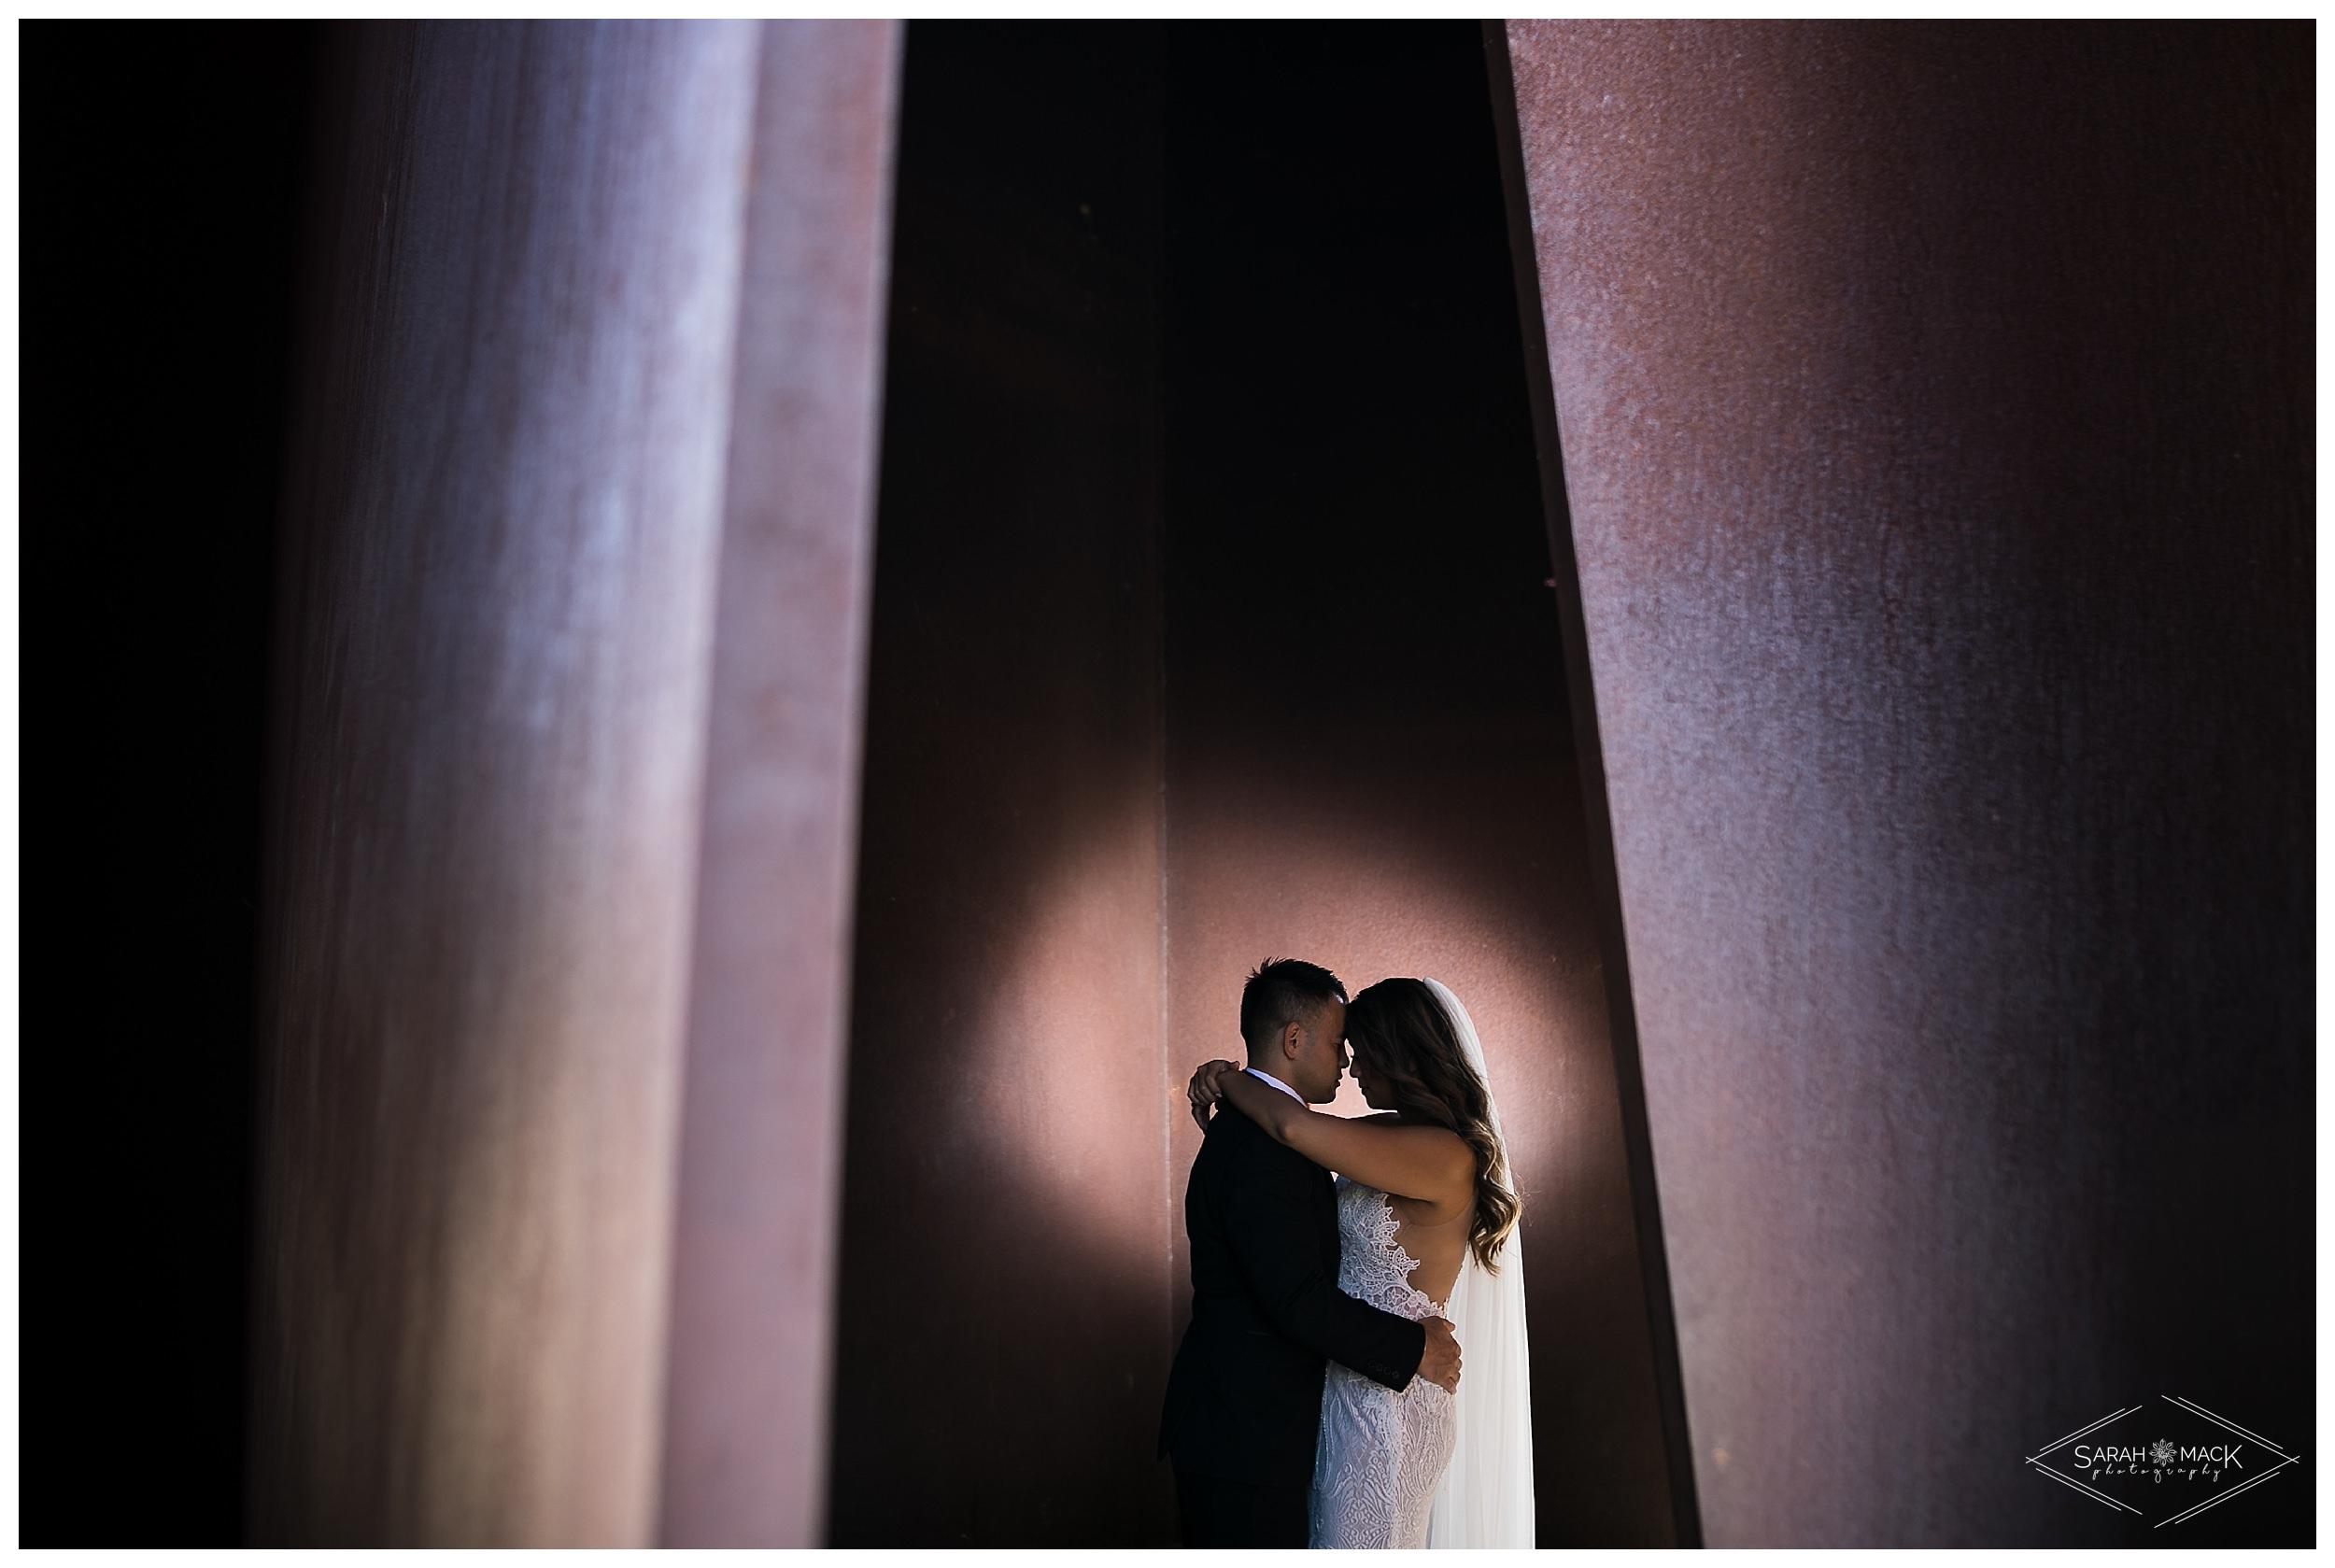 LE-Avenue-of-the-Arts-Costa-Mesa-Wedding-Photography-0128.jpg